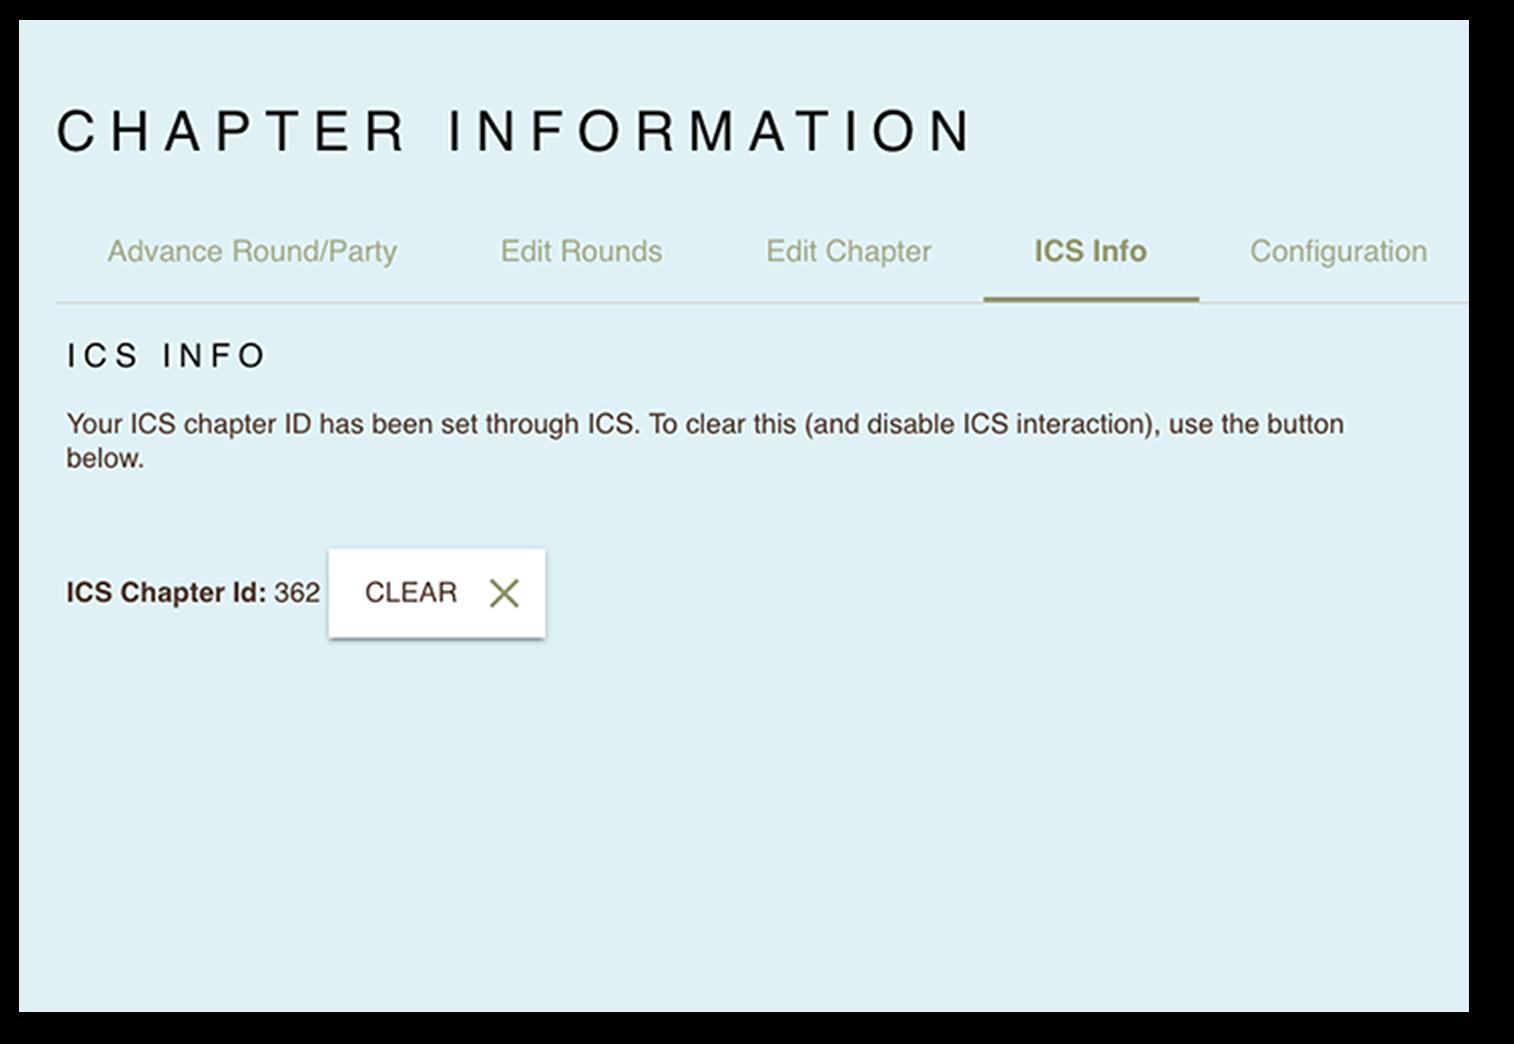 OmegaFi_RecruitICS-Integration-croppedNEW